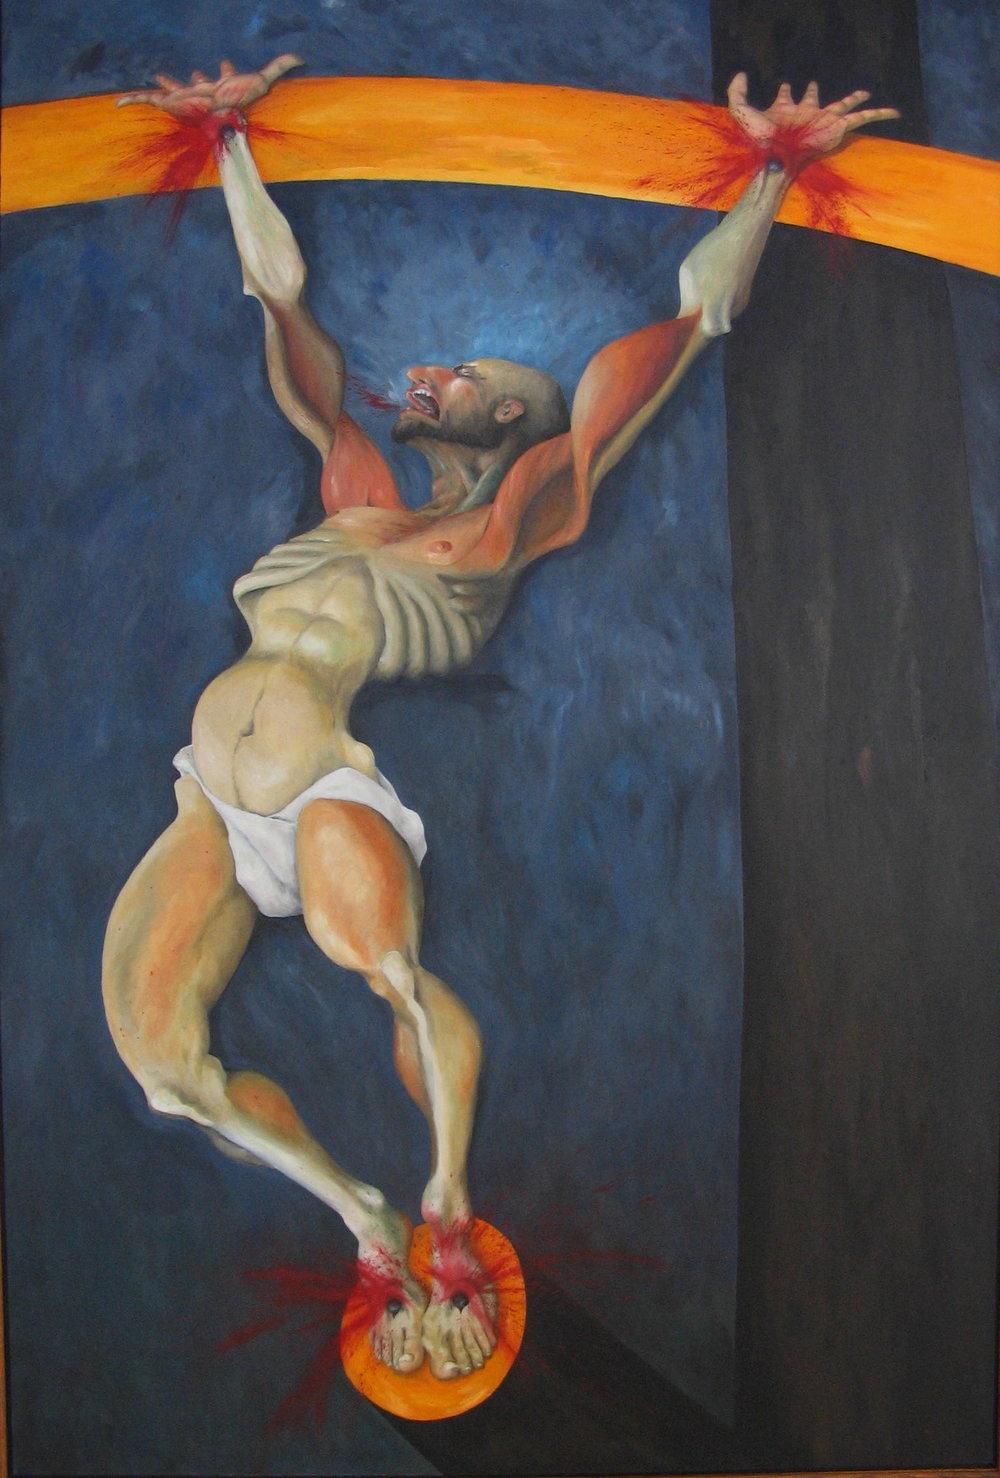 Crucifixion #5